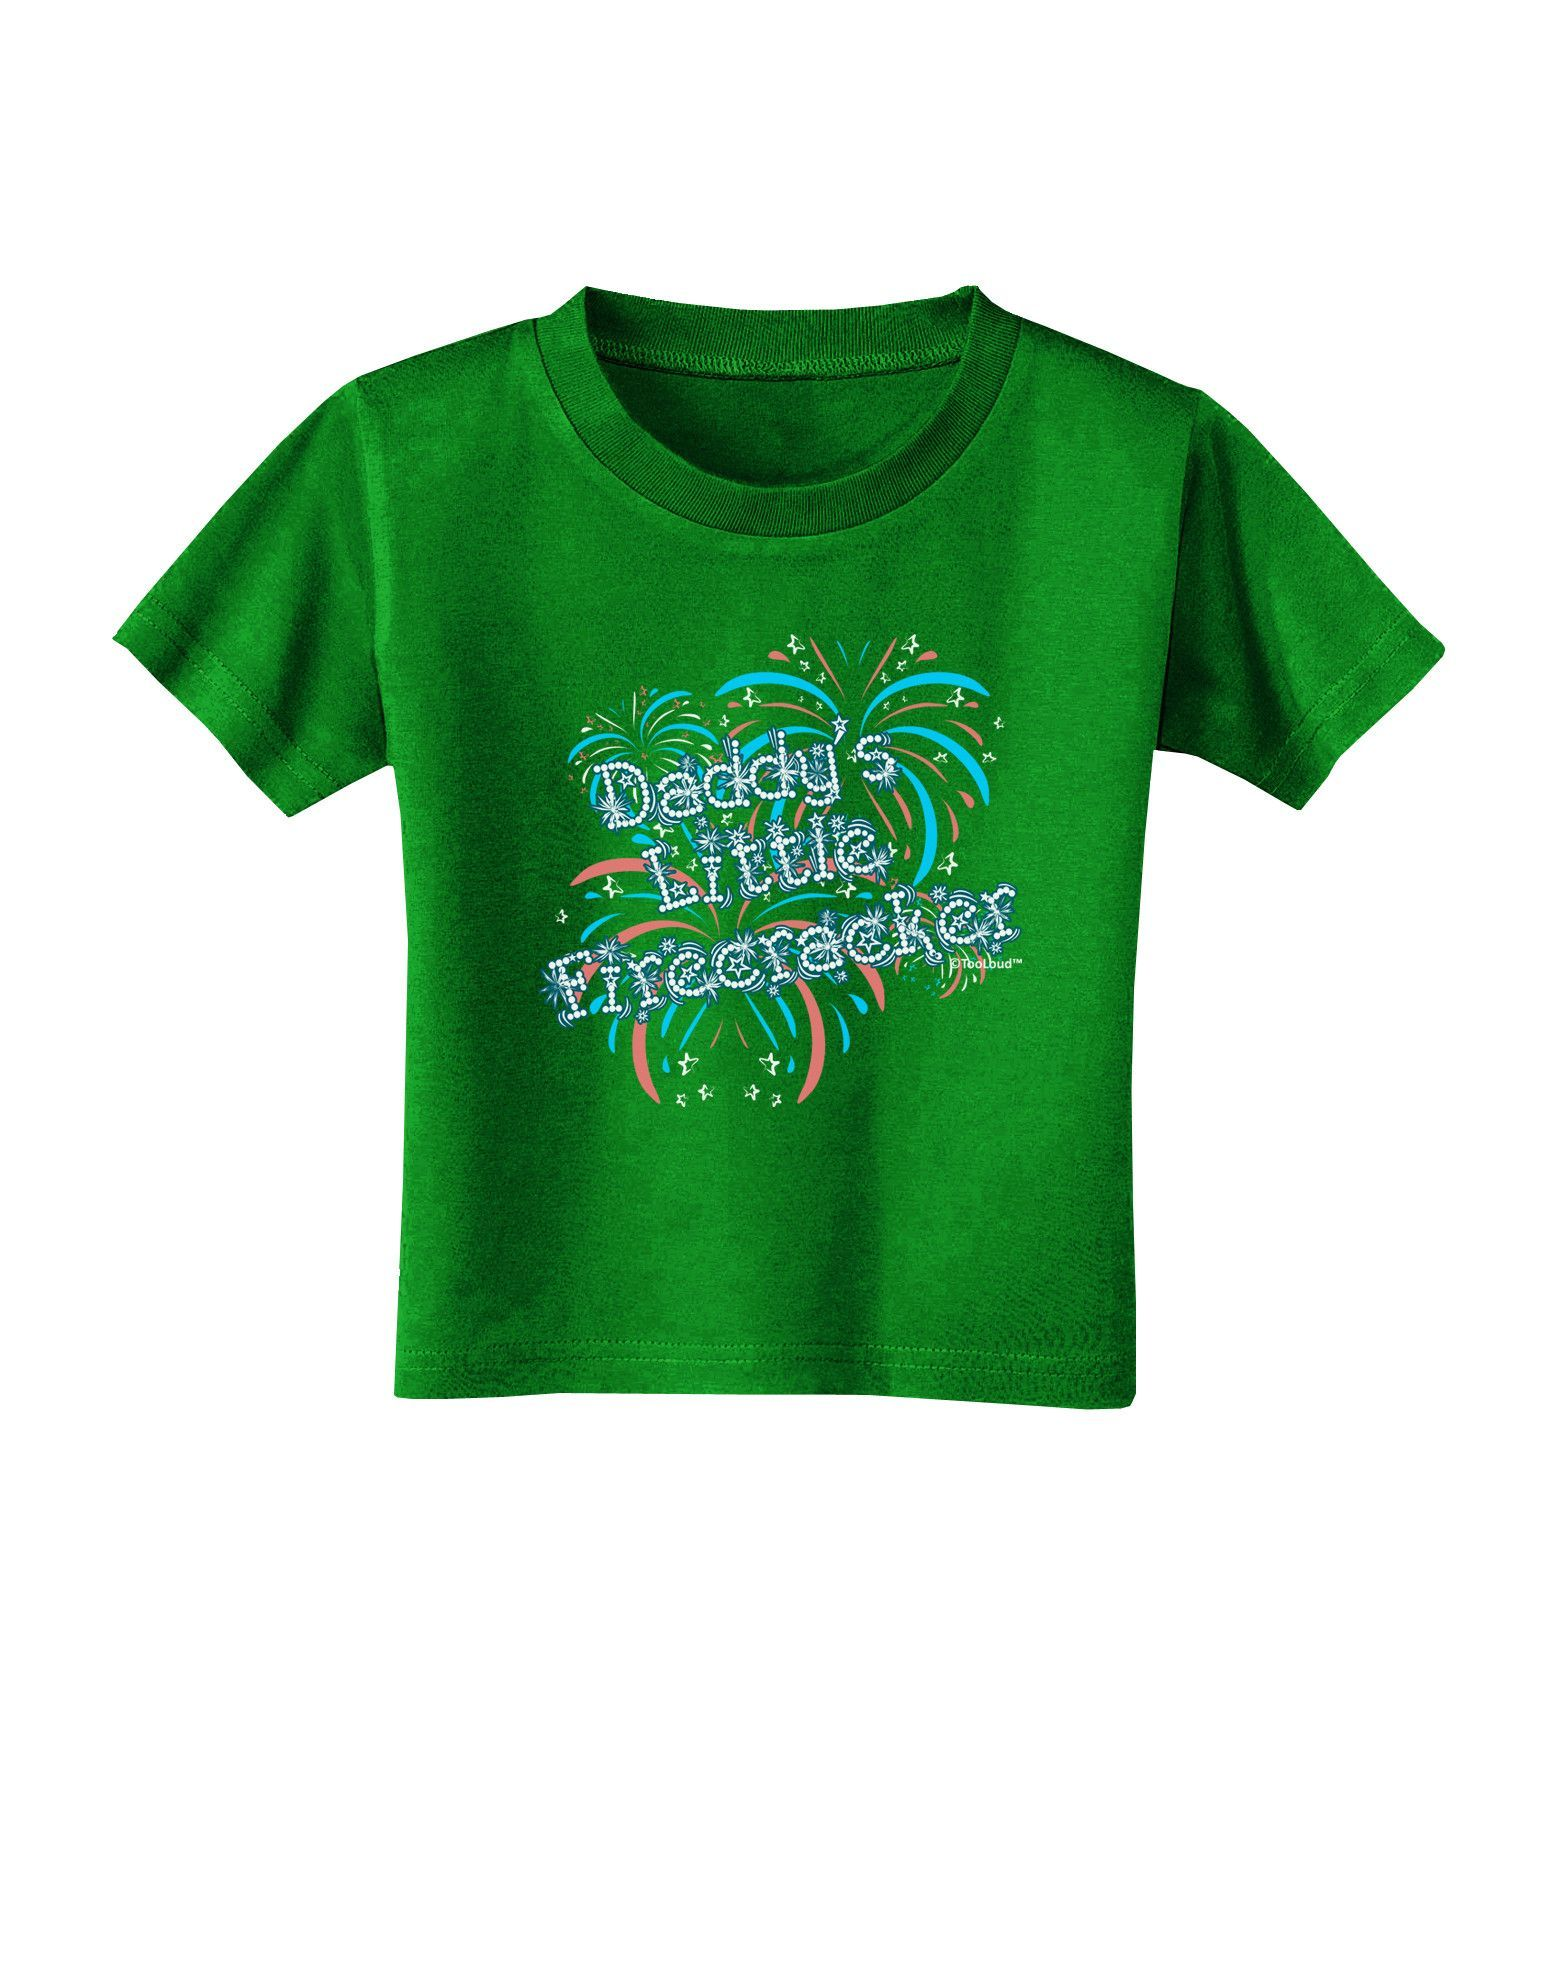 TooLoud Buy Local Produce Text Infant T-Shirt Dark